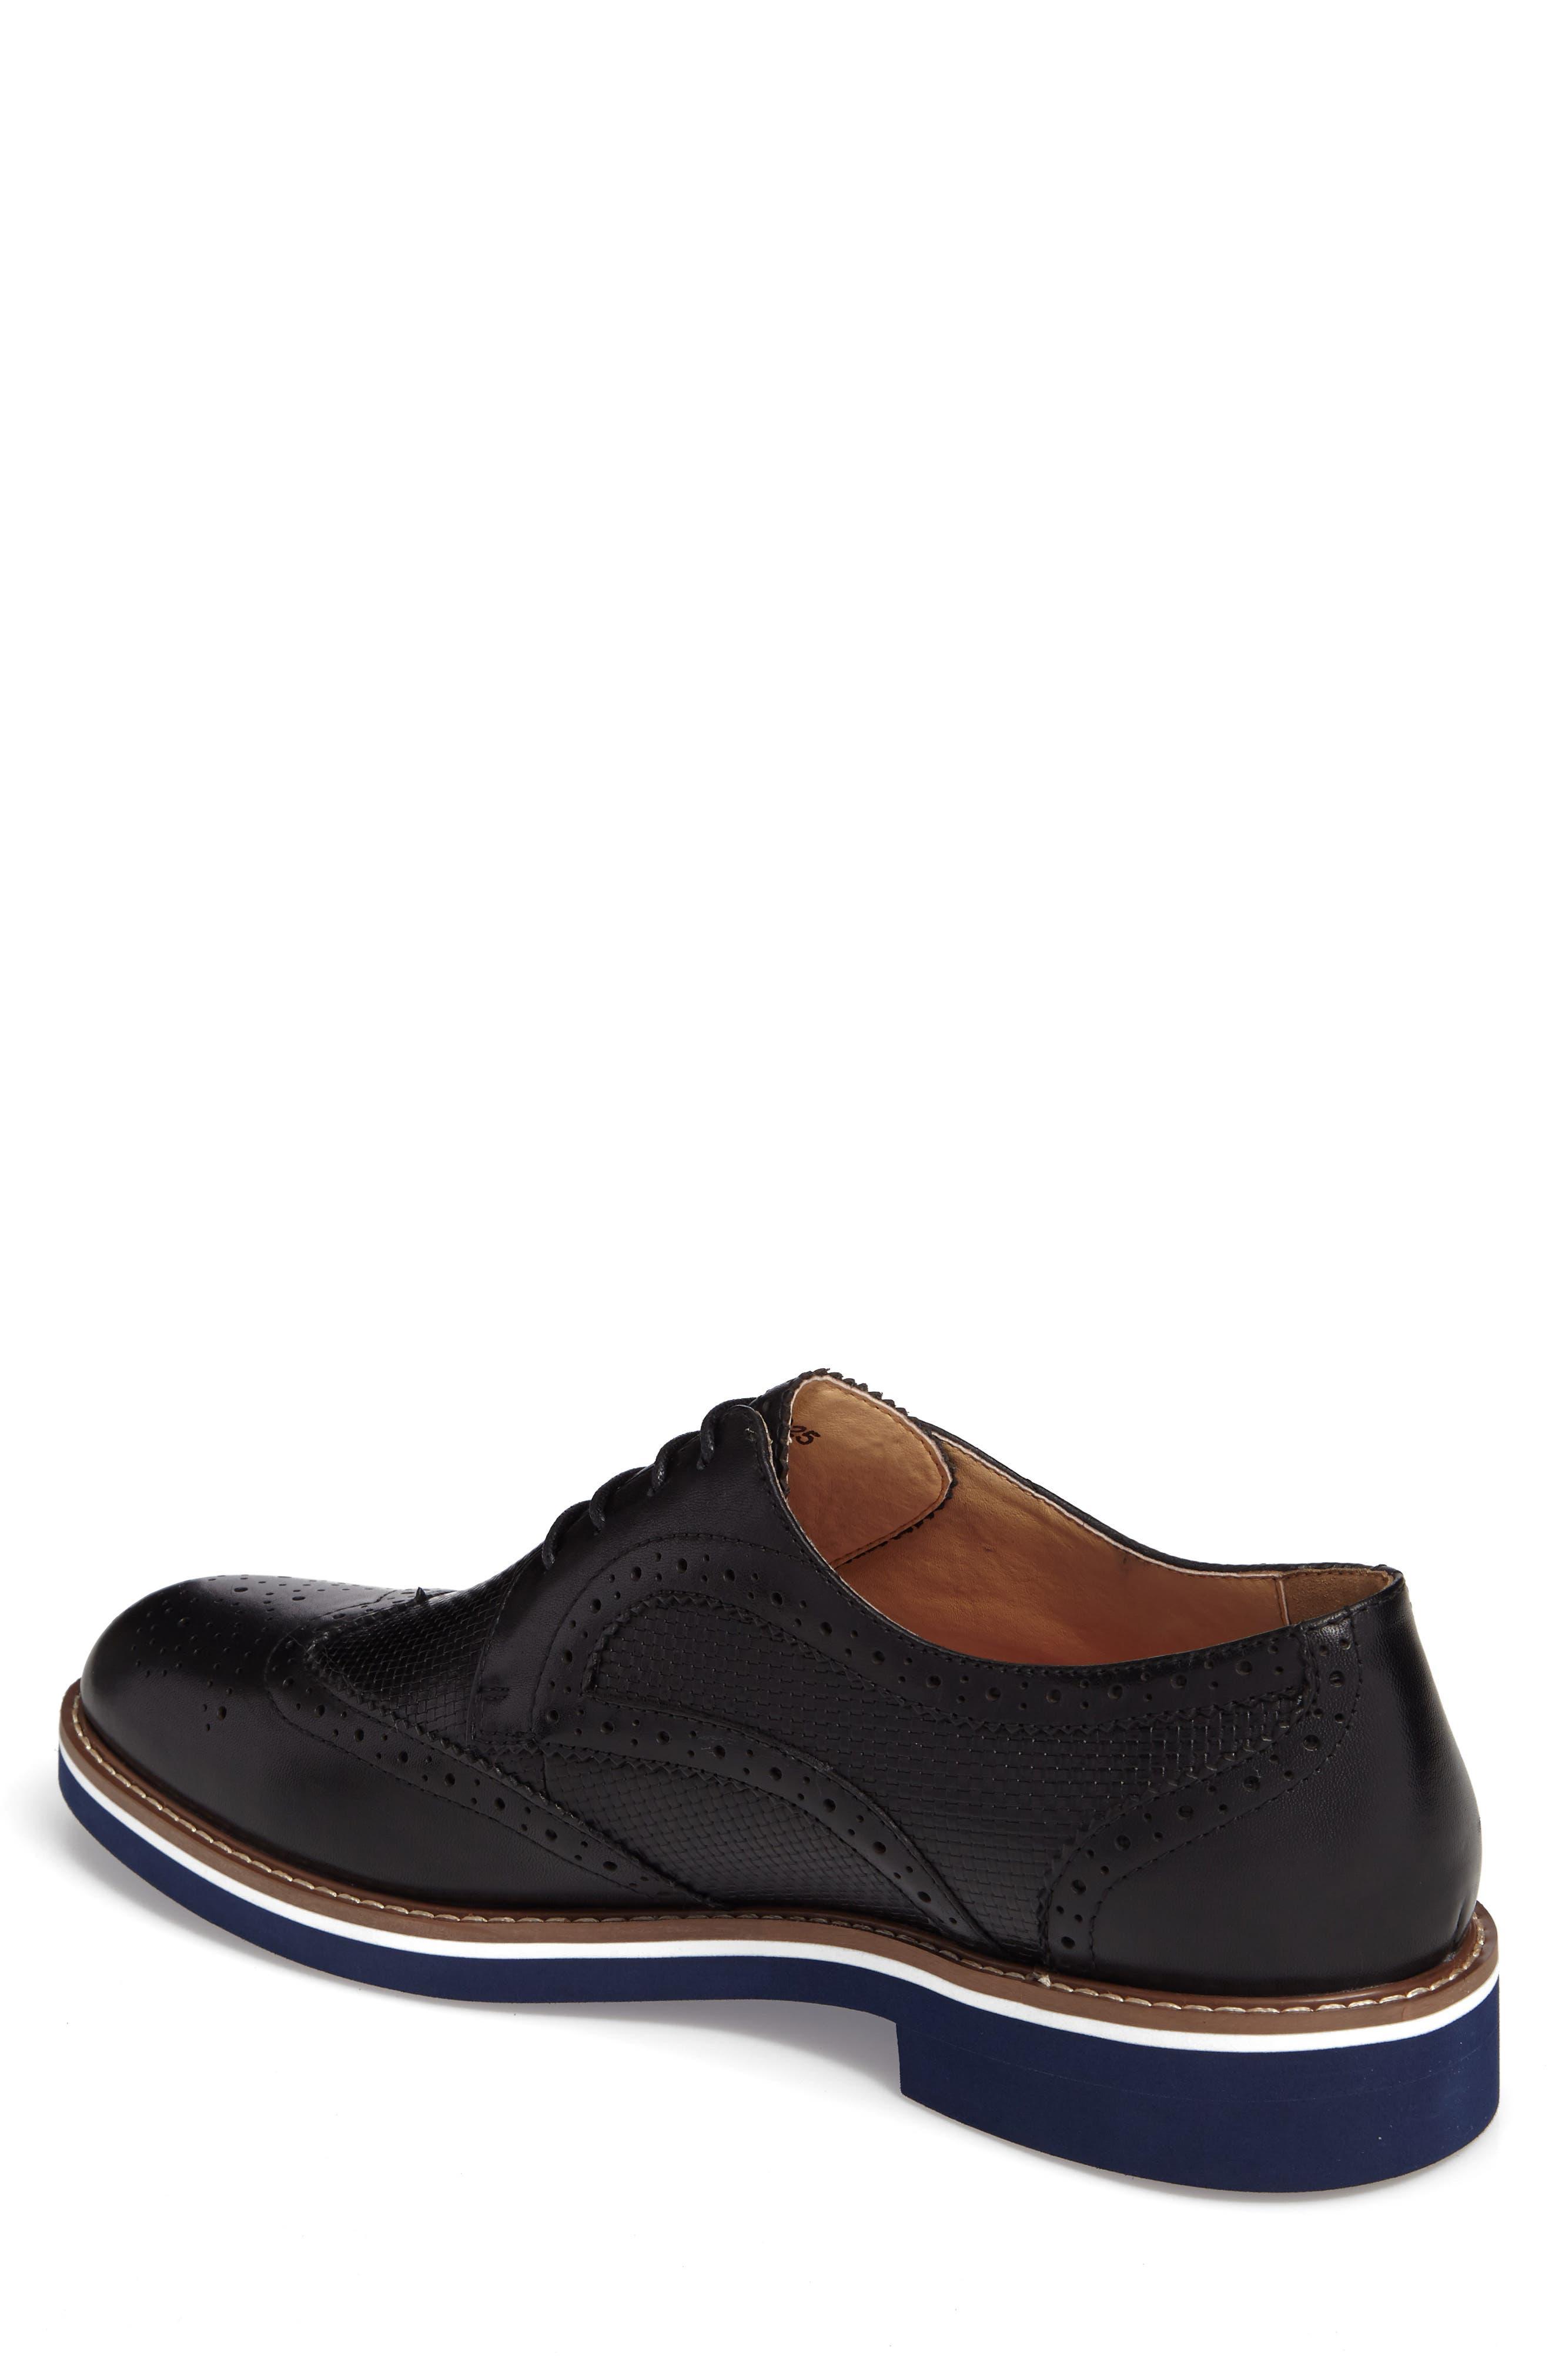 Northfields Spectator Shoe,                             Alternate thumbnail 2, color,                             001